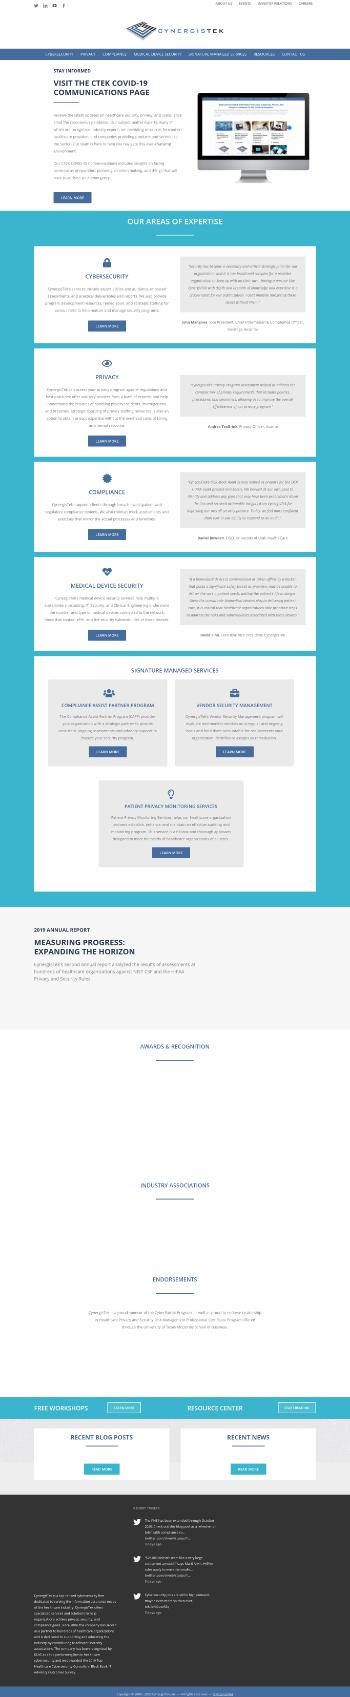 CynergisTek, Inc. Website Screenshot